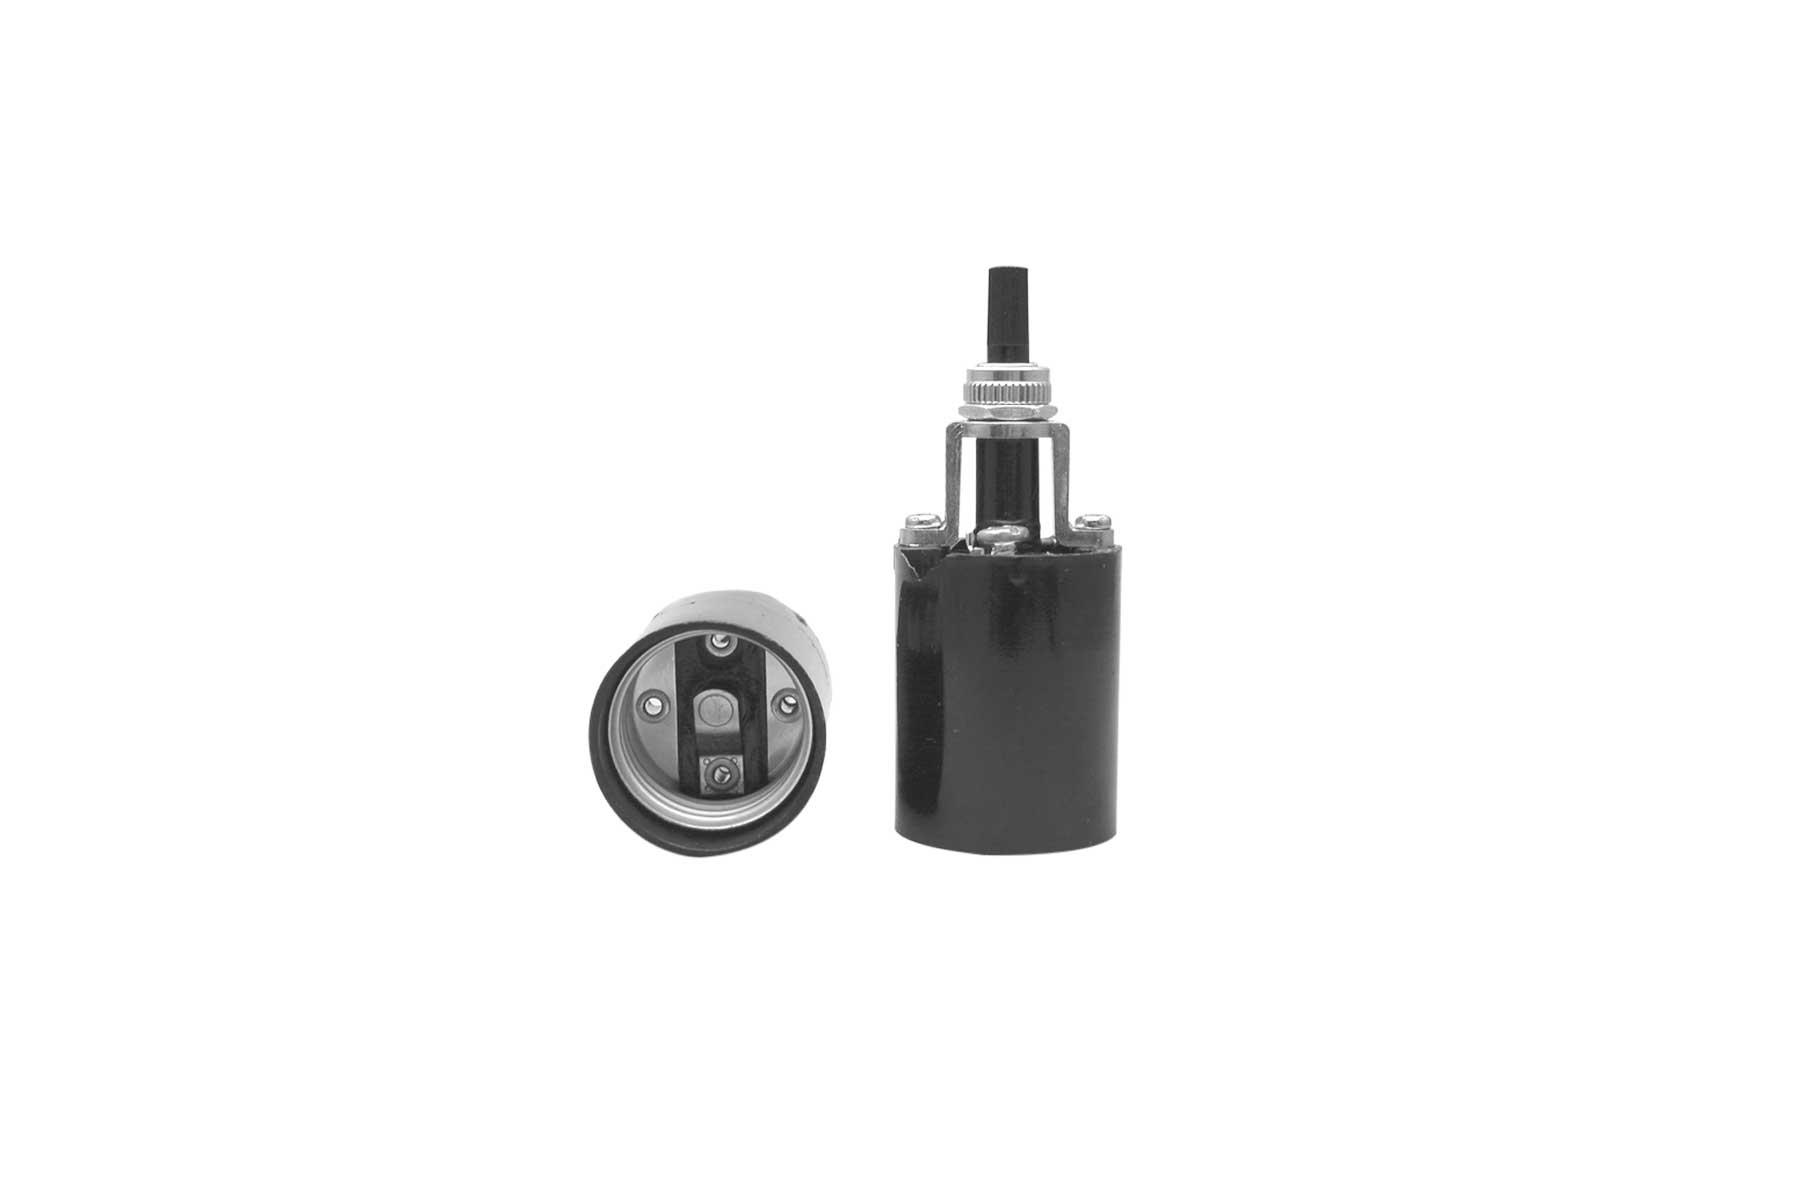 Medium Base Single Light One Piece Bottom Turn Knob Phenolic Incandescent Light Socket